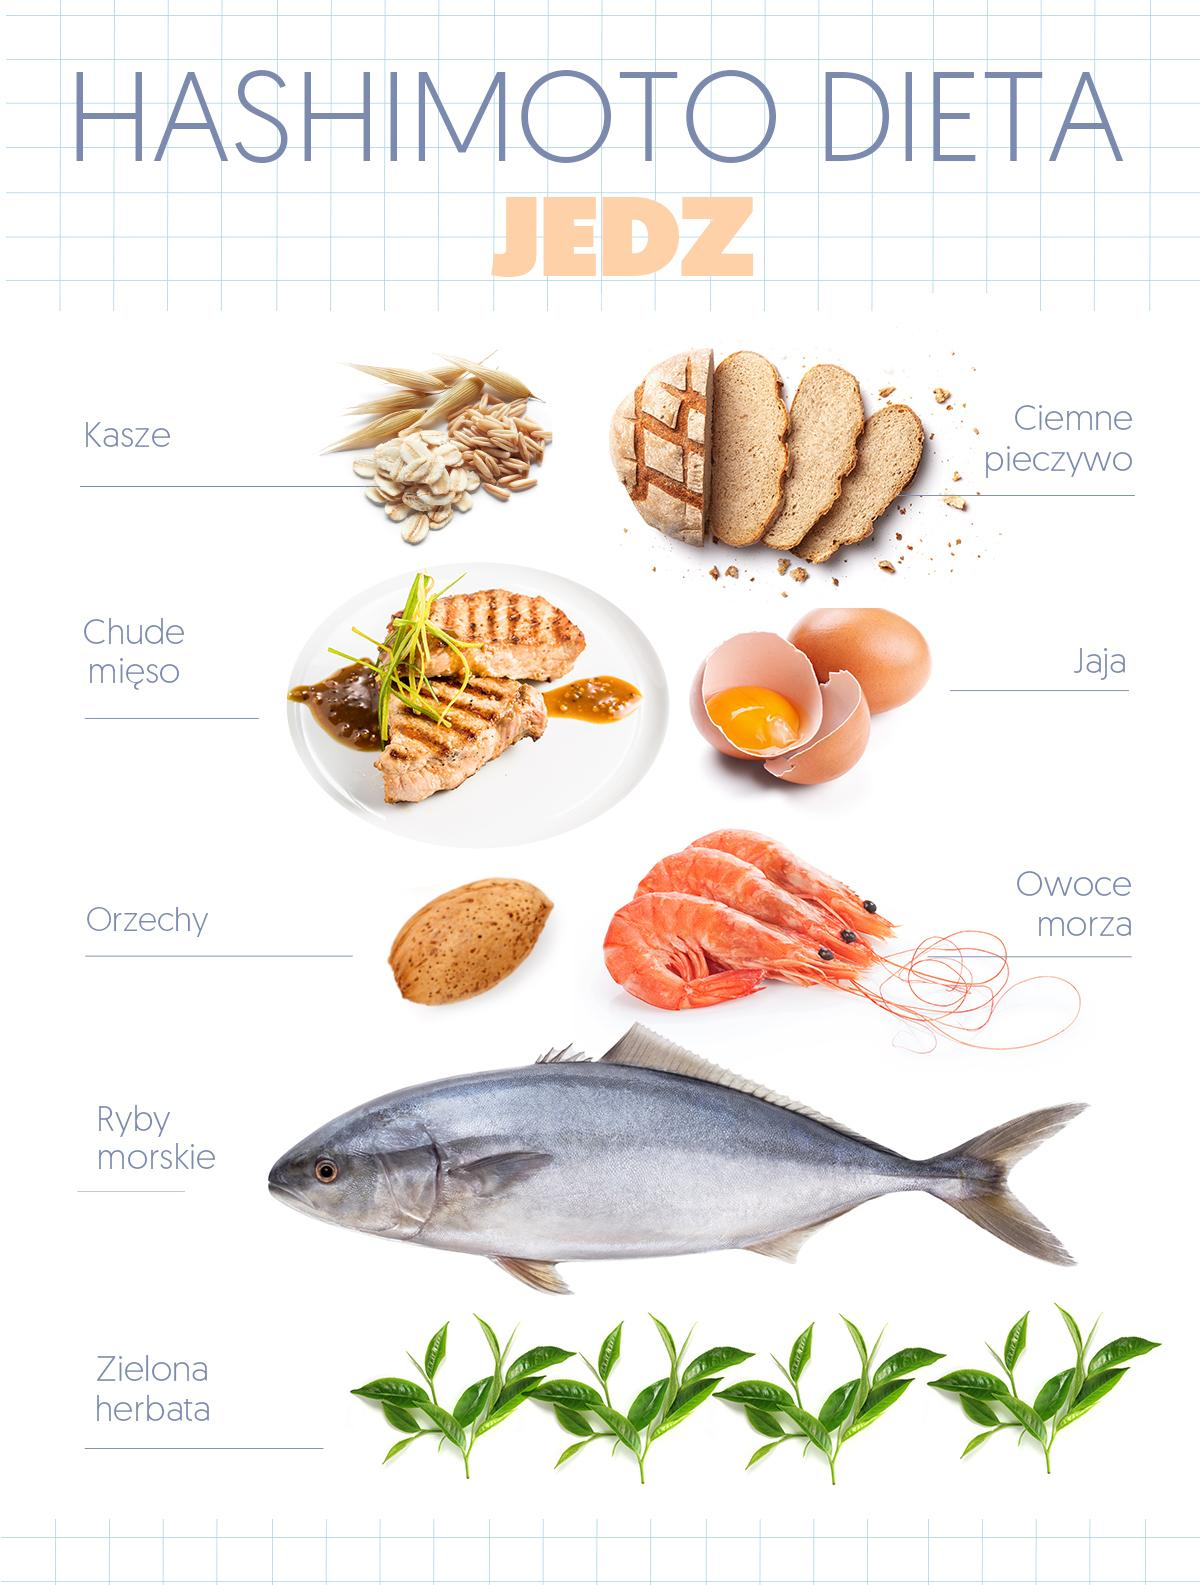 hashimoto dieta produkty